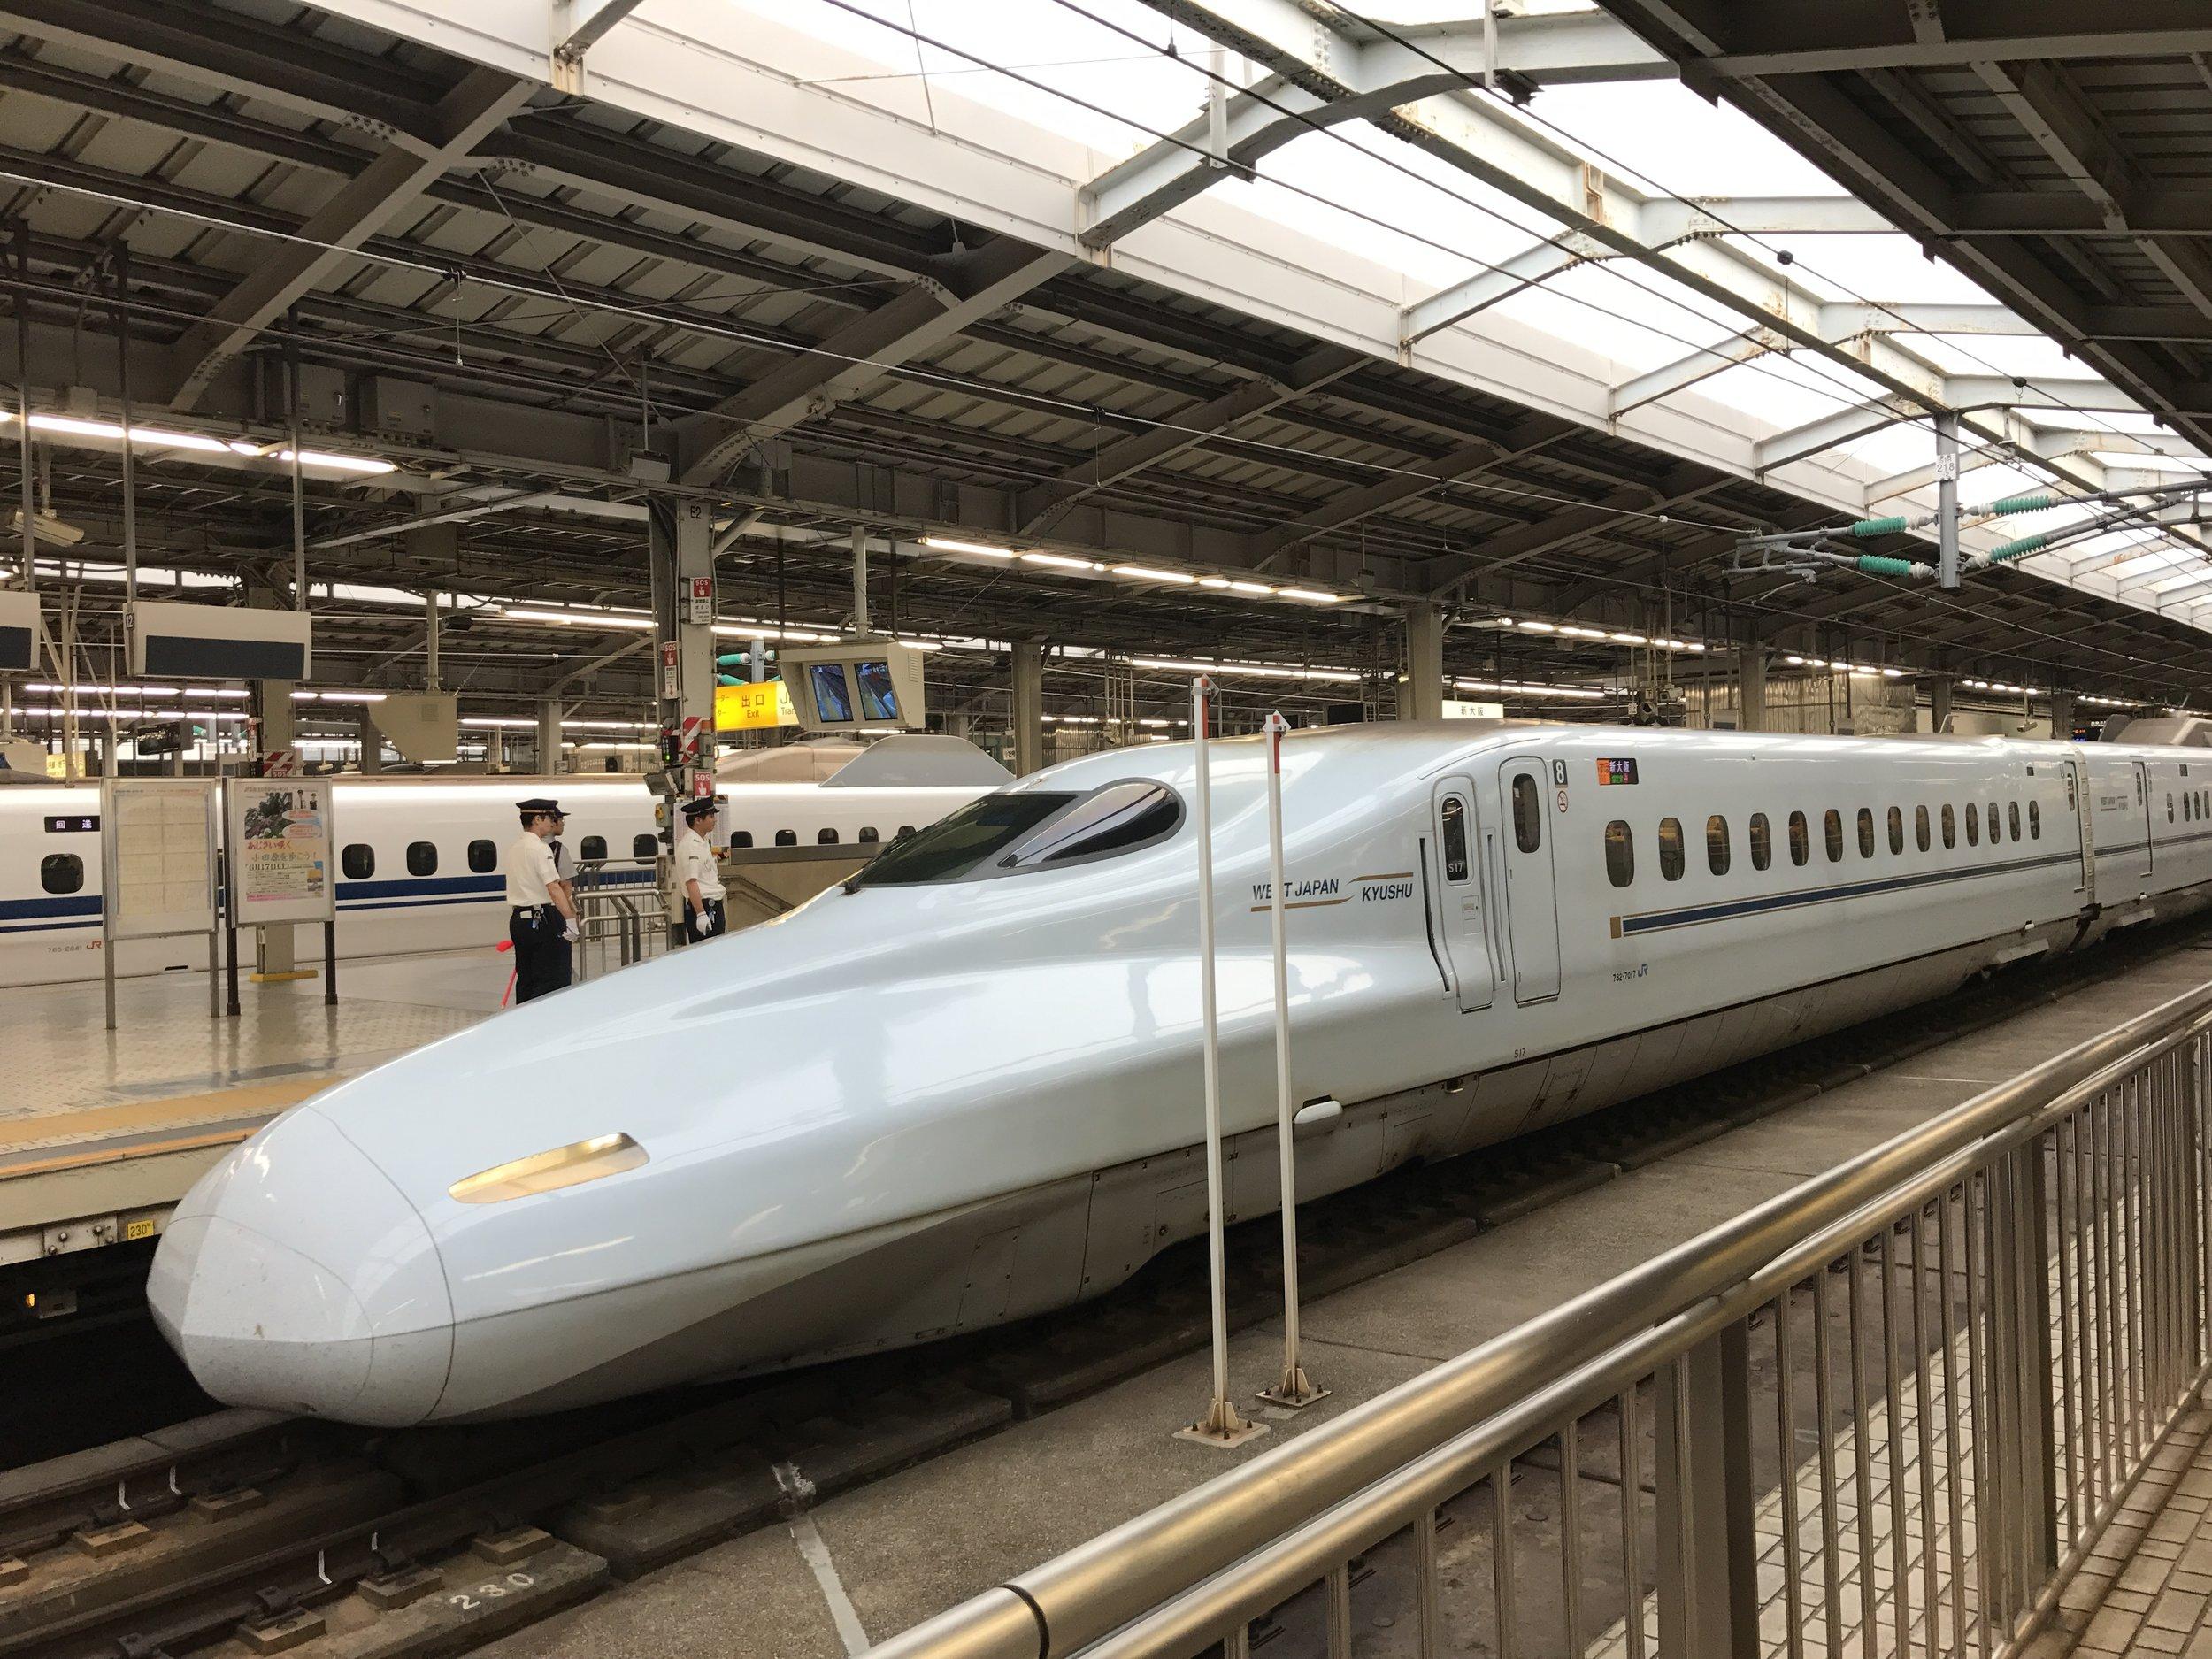 Bullet train in Osaka station